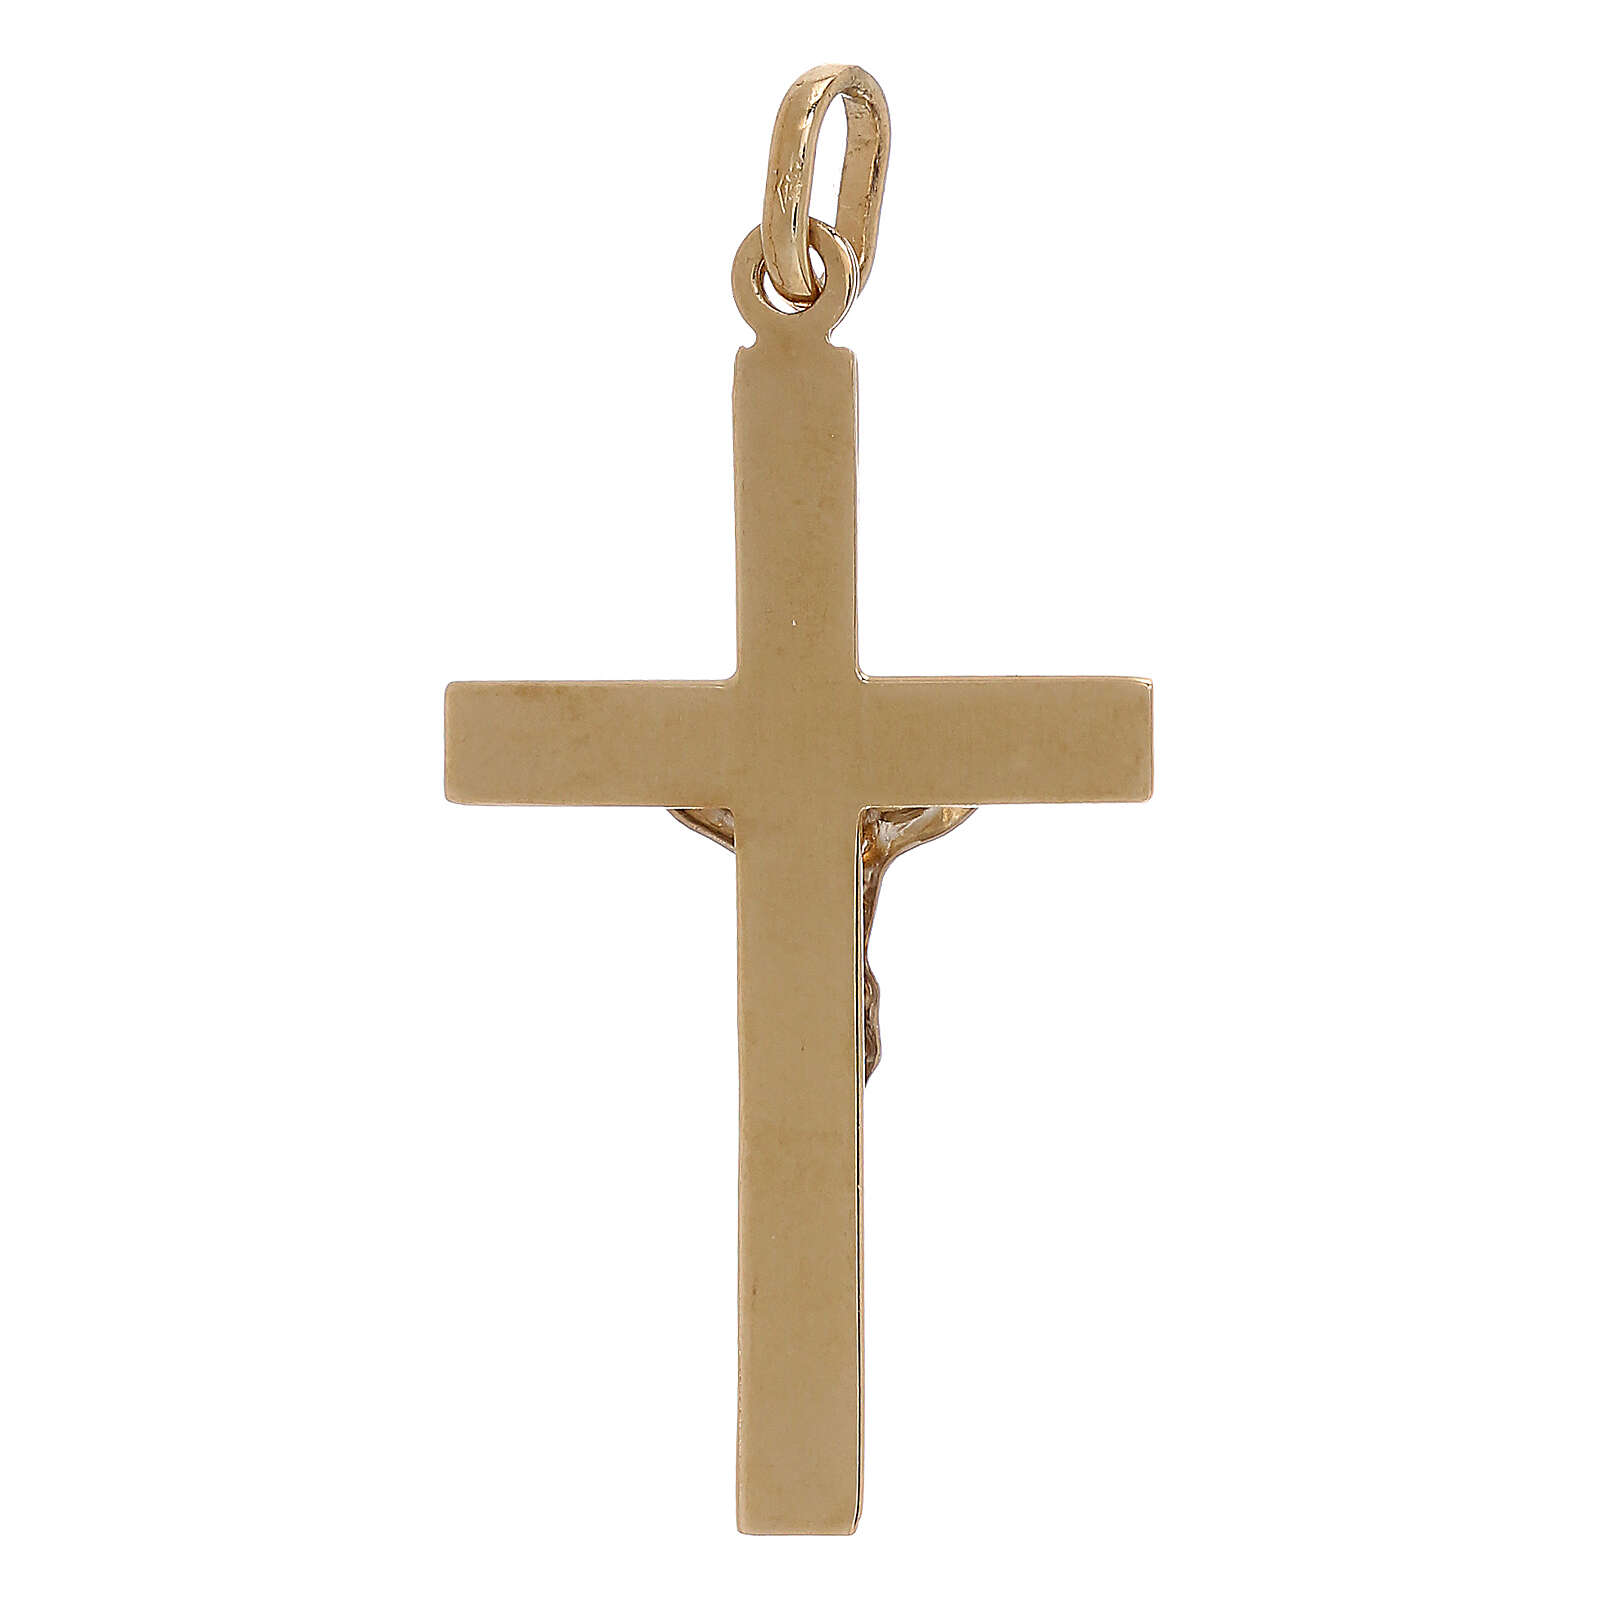 Cruz colgante bicolor relieve oro 18 quilates 1,2 gr 4